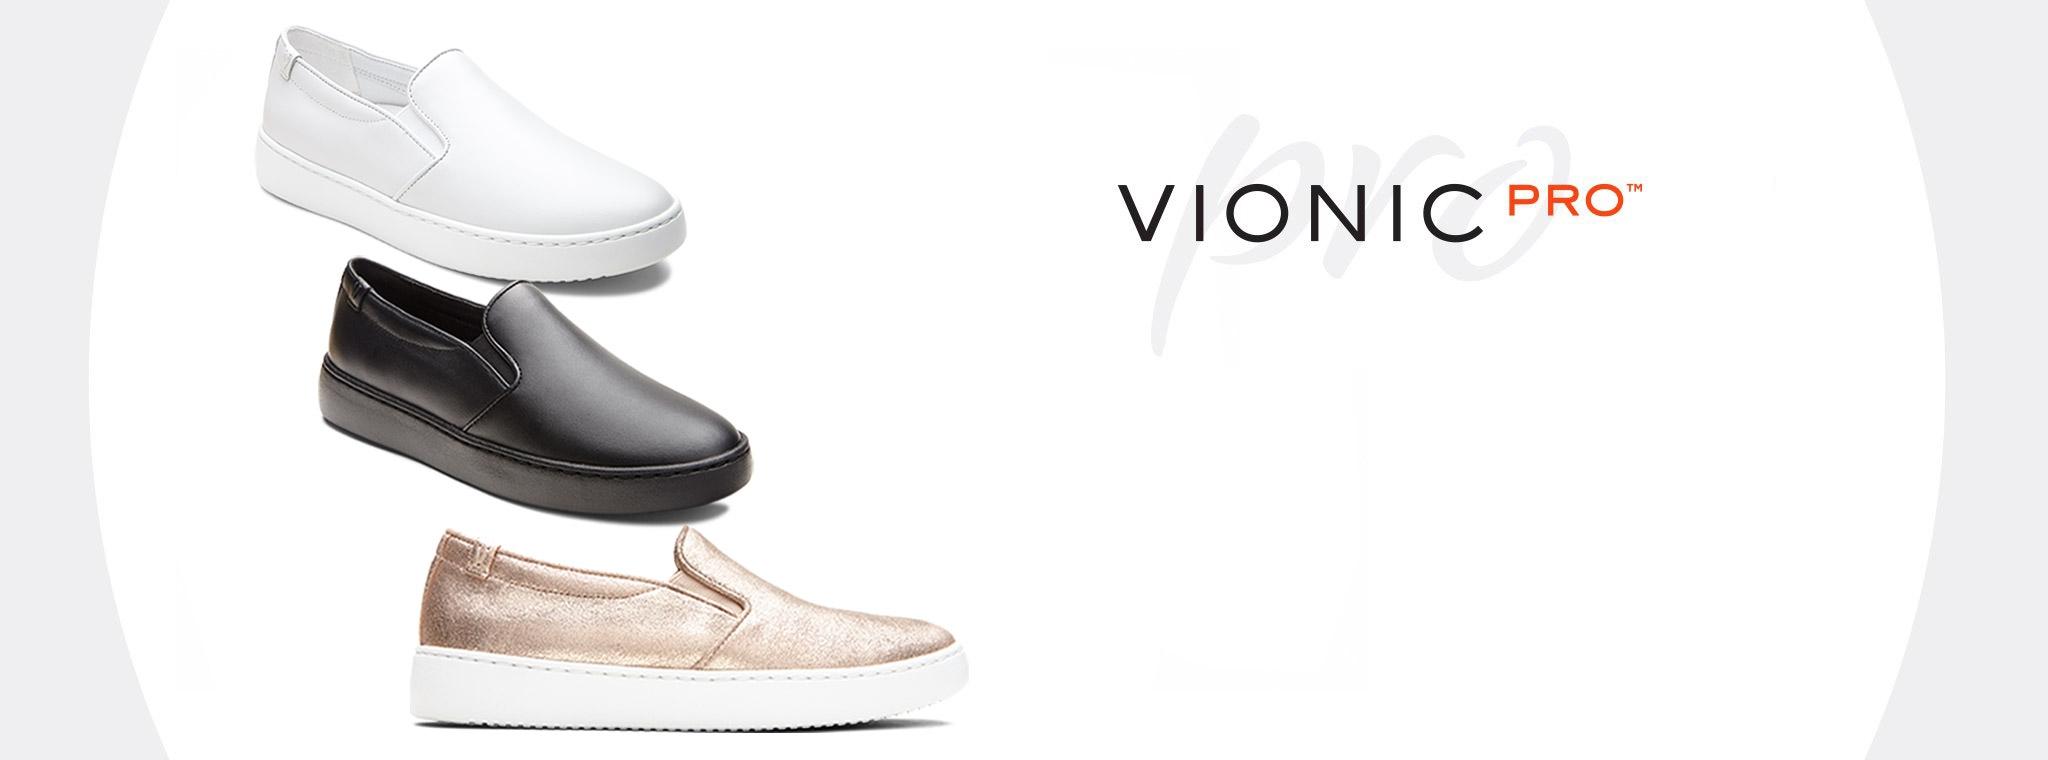 Vionic Pro